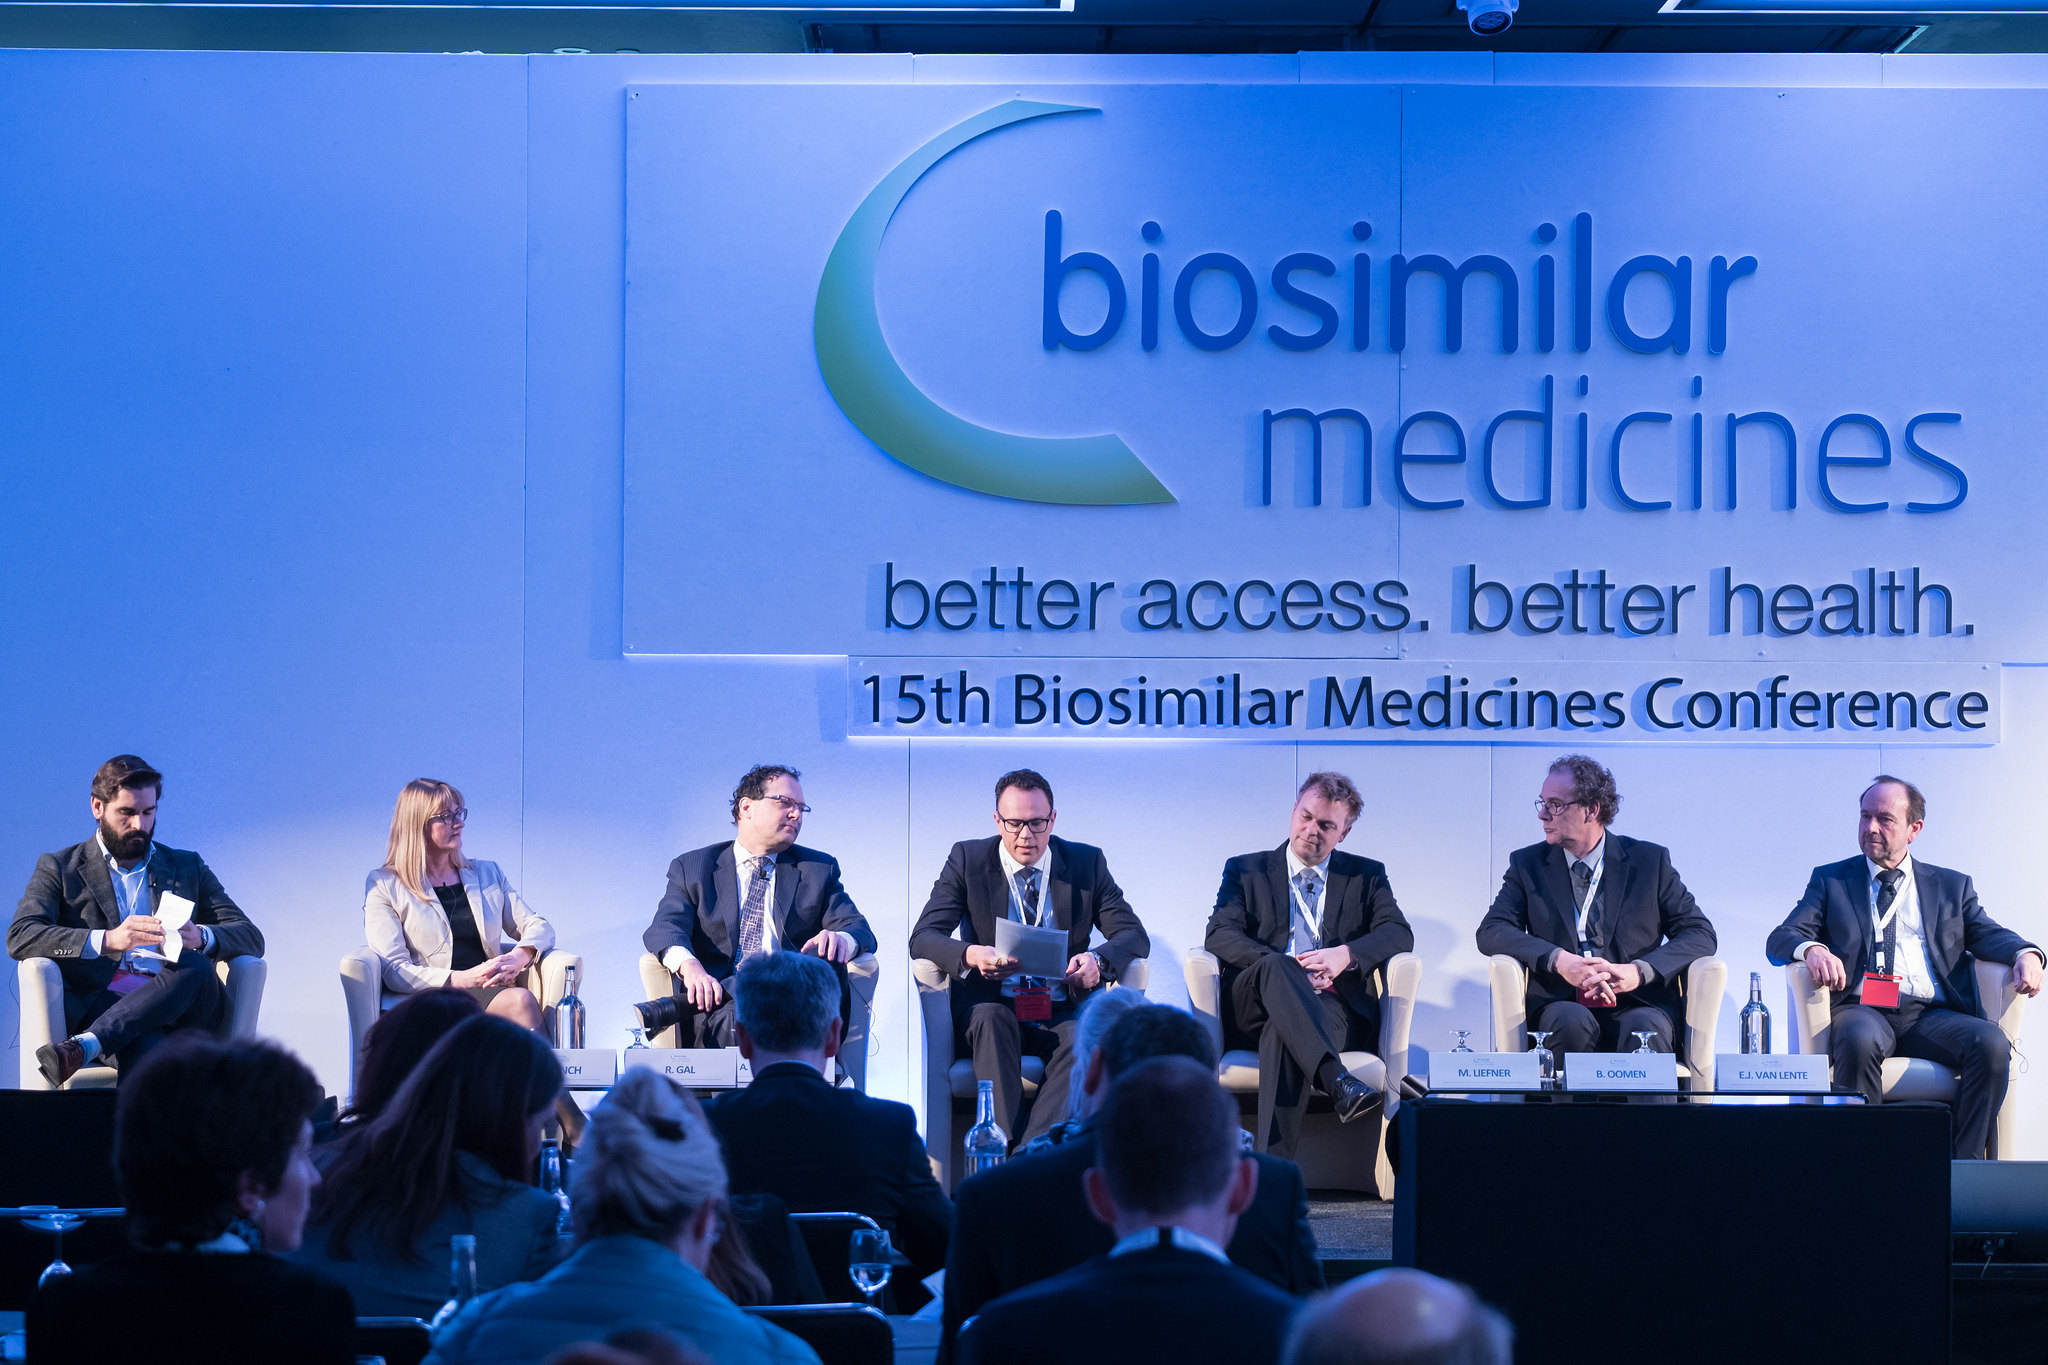 15th Biosimilar Medicines Conference